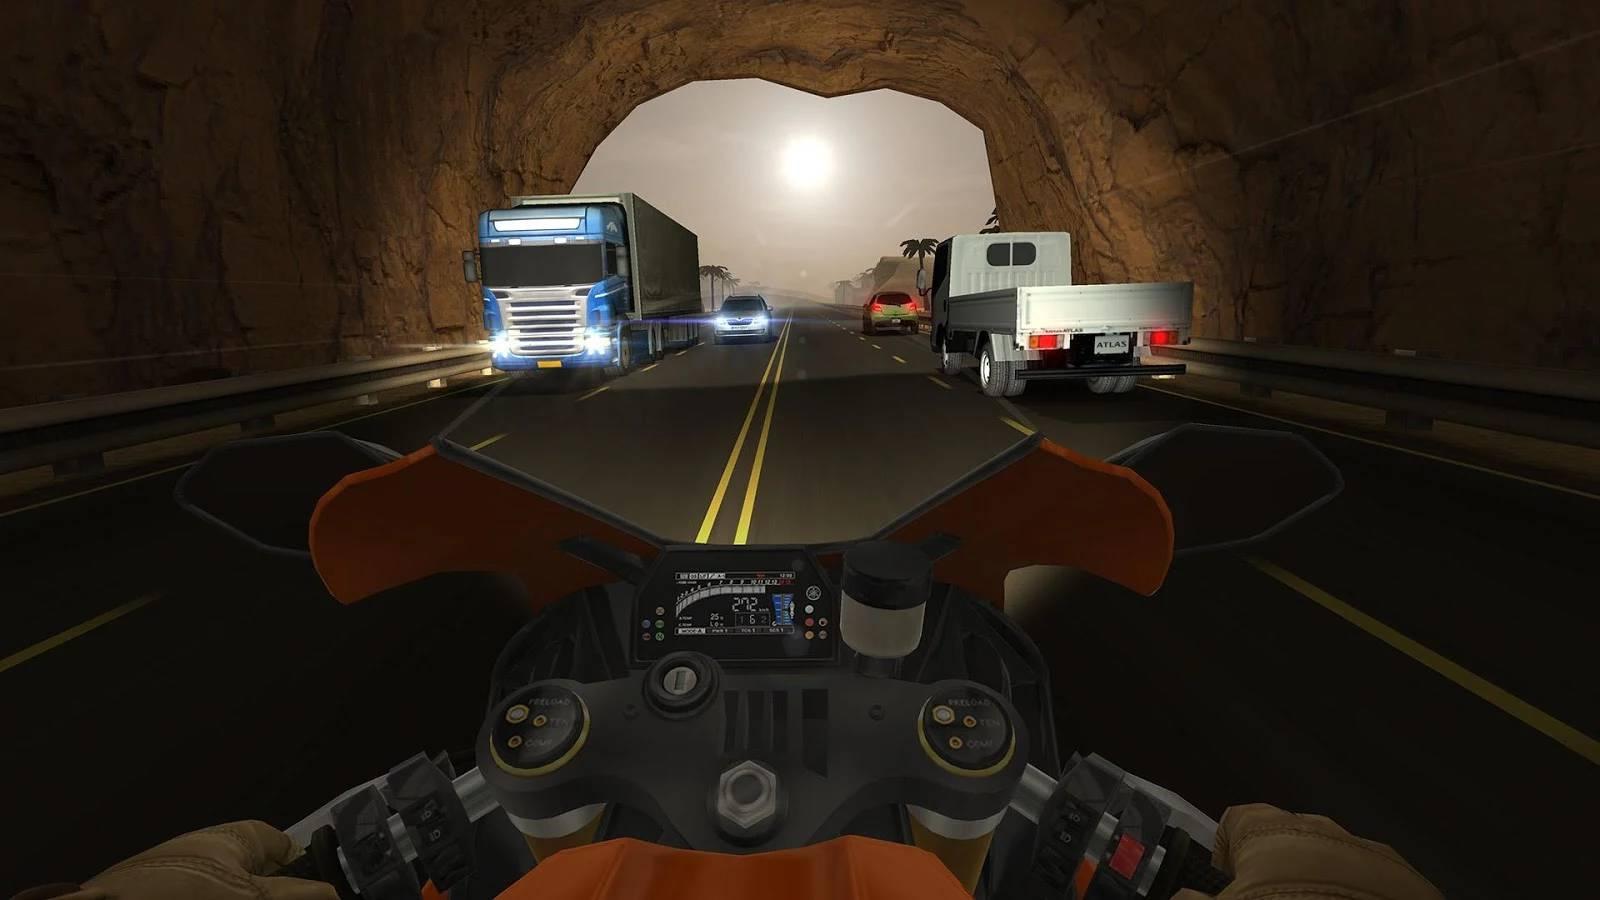 Traffic Rider 1 61 Para Hileli Mod Apk indir » APK Dayı